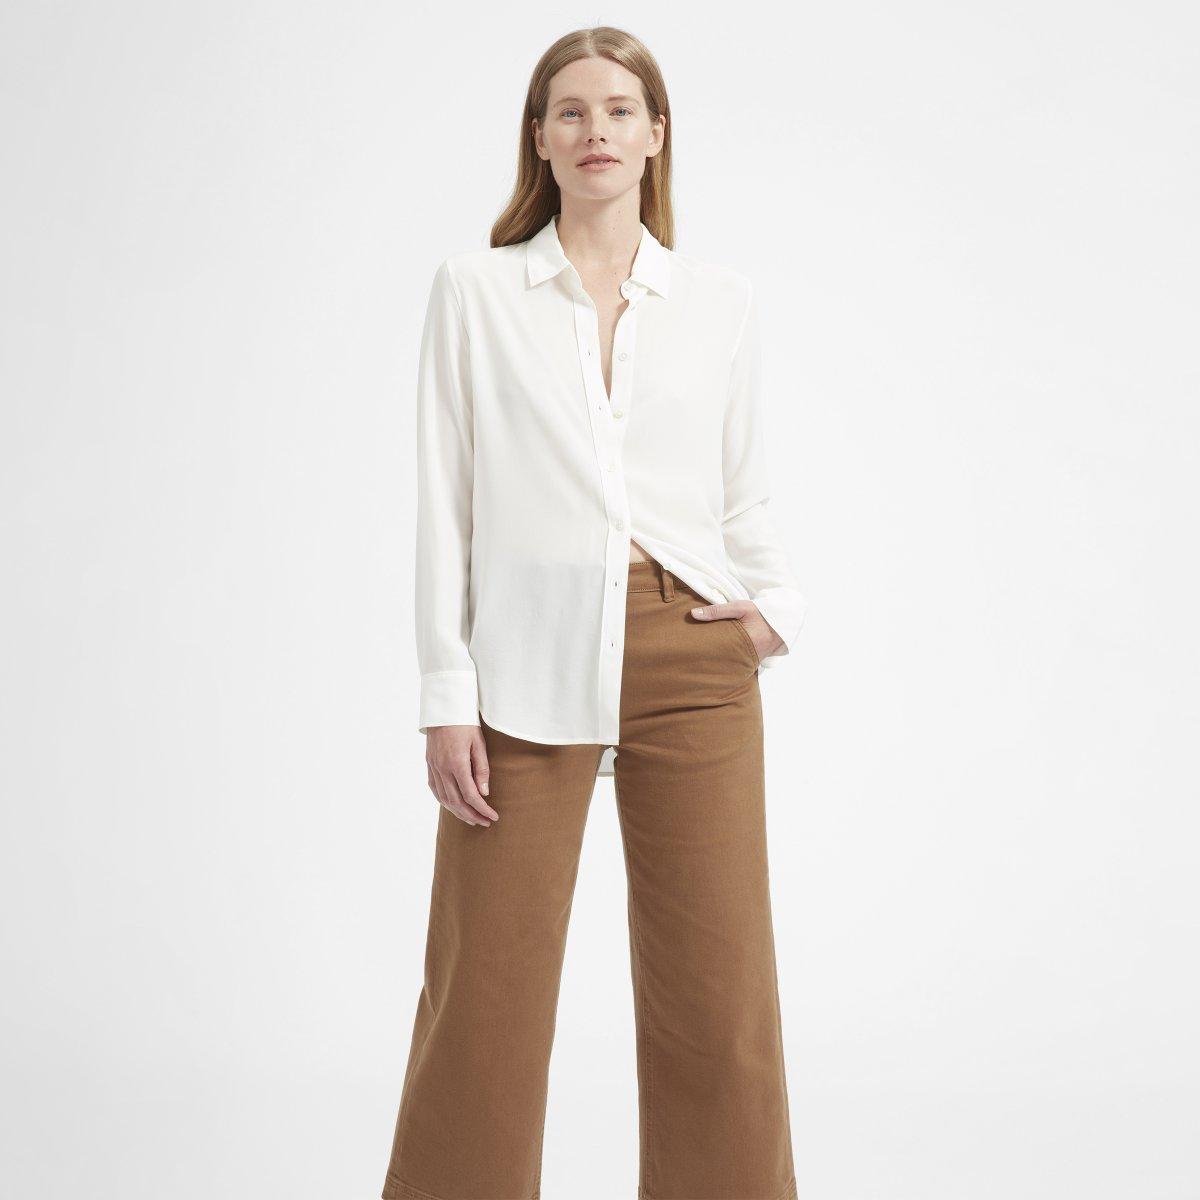 Everlane - The Relaxed Silk Shirt $88 (similar)